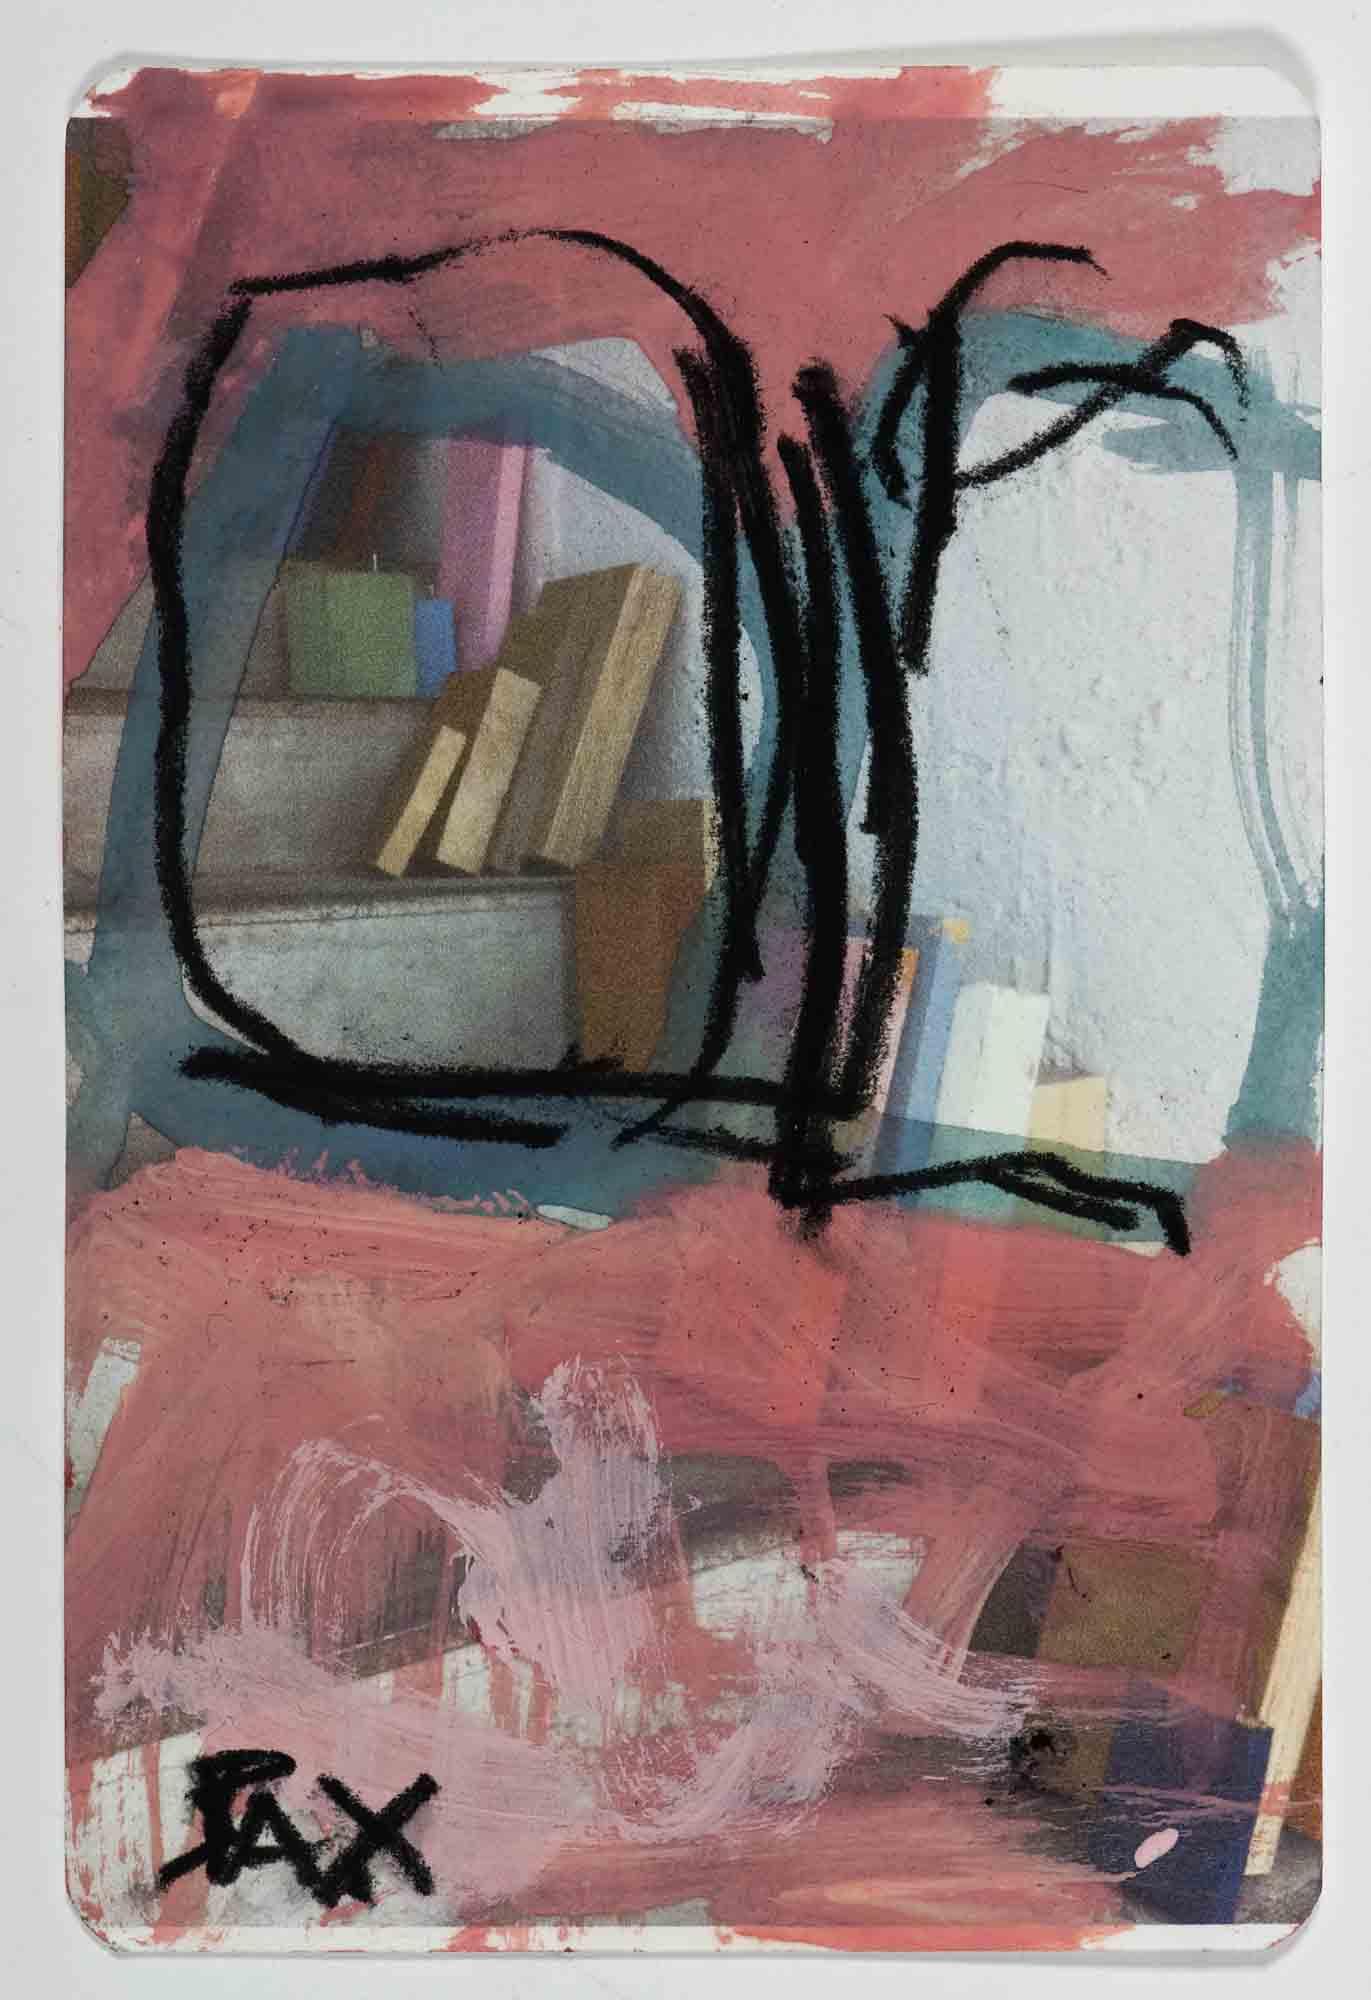 Matthew Bax,  Sample Chapter 6,  2012, acrylic, charcoal, pencil, wax crayon on paper, 15 x 10cm